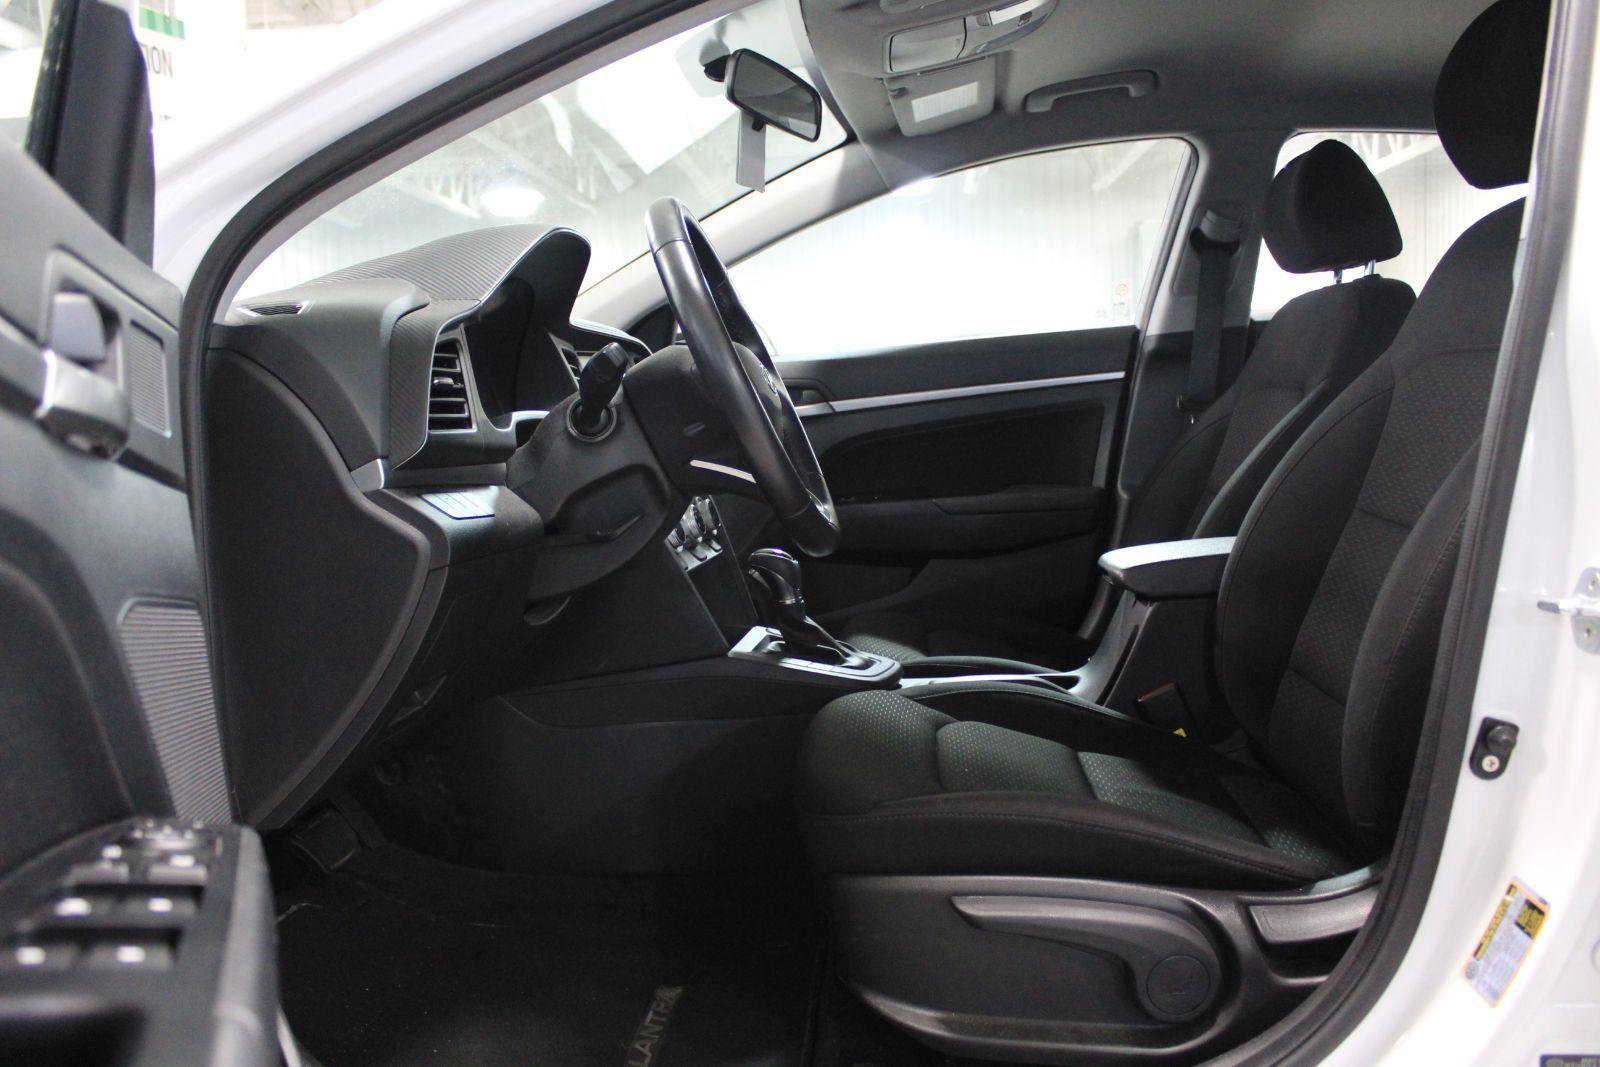 2019 Honda Civic Sedan complet